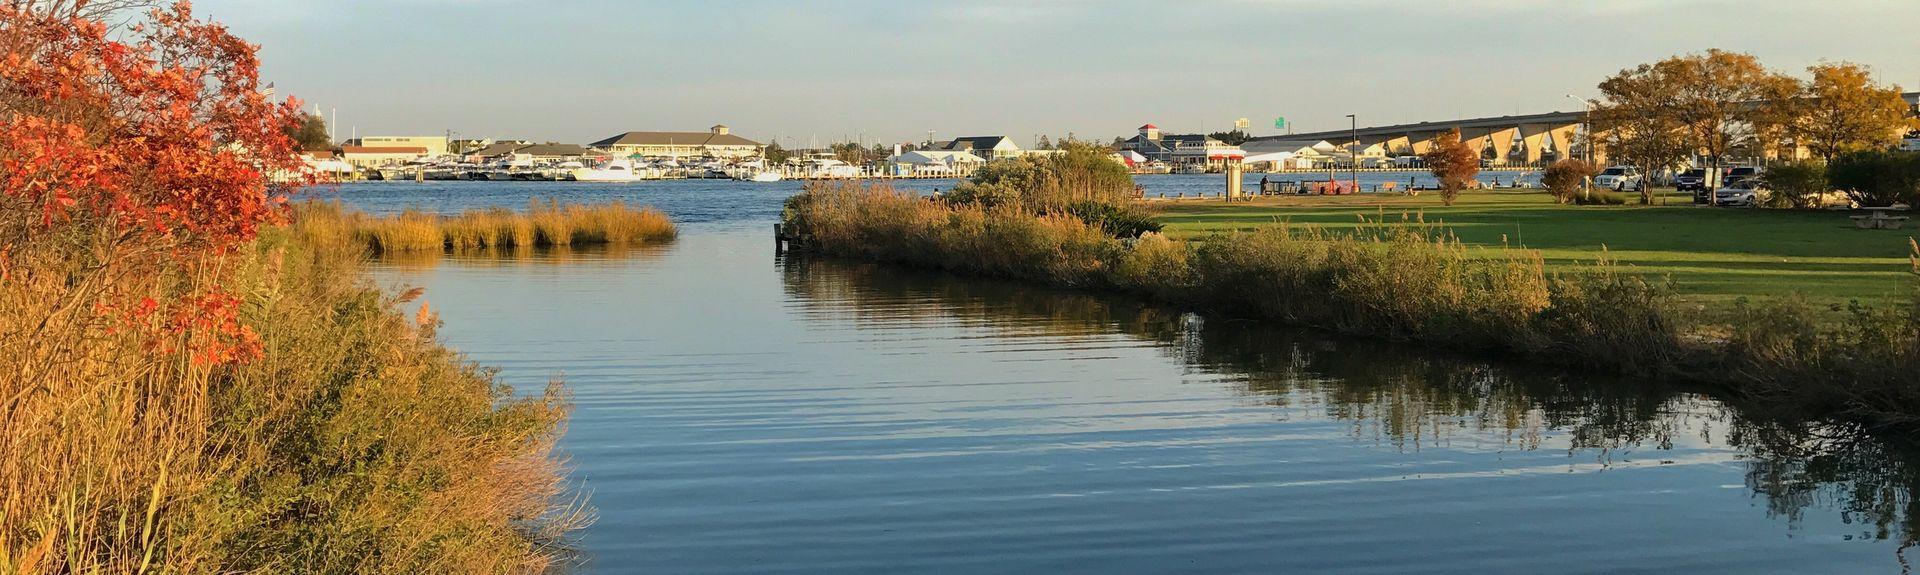 Kent Island, Maryland, USA